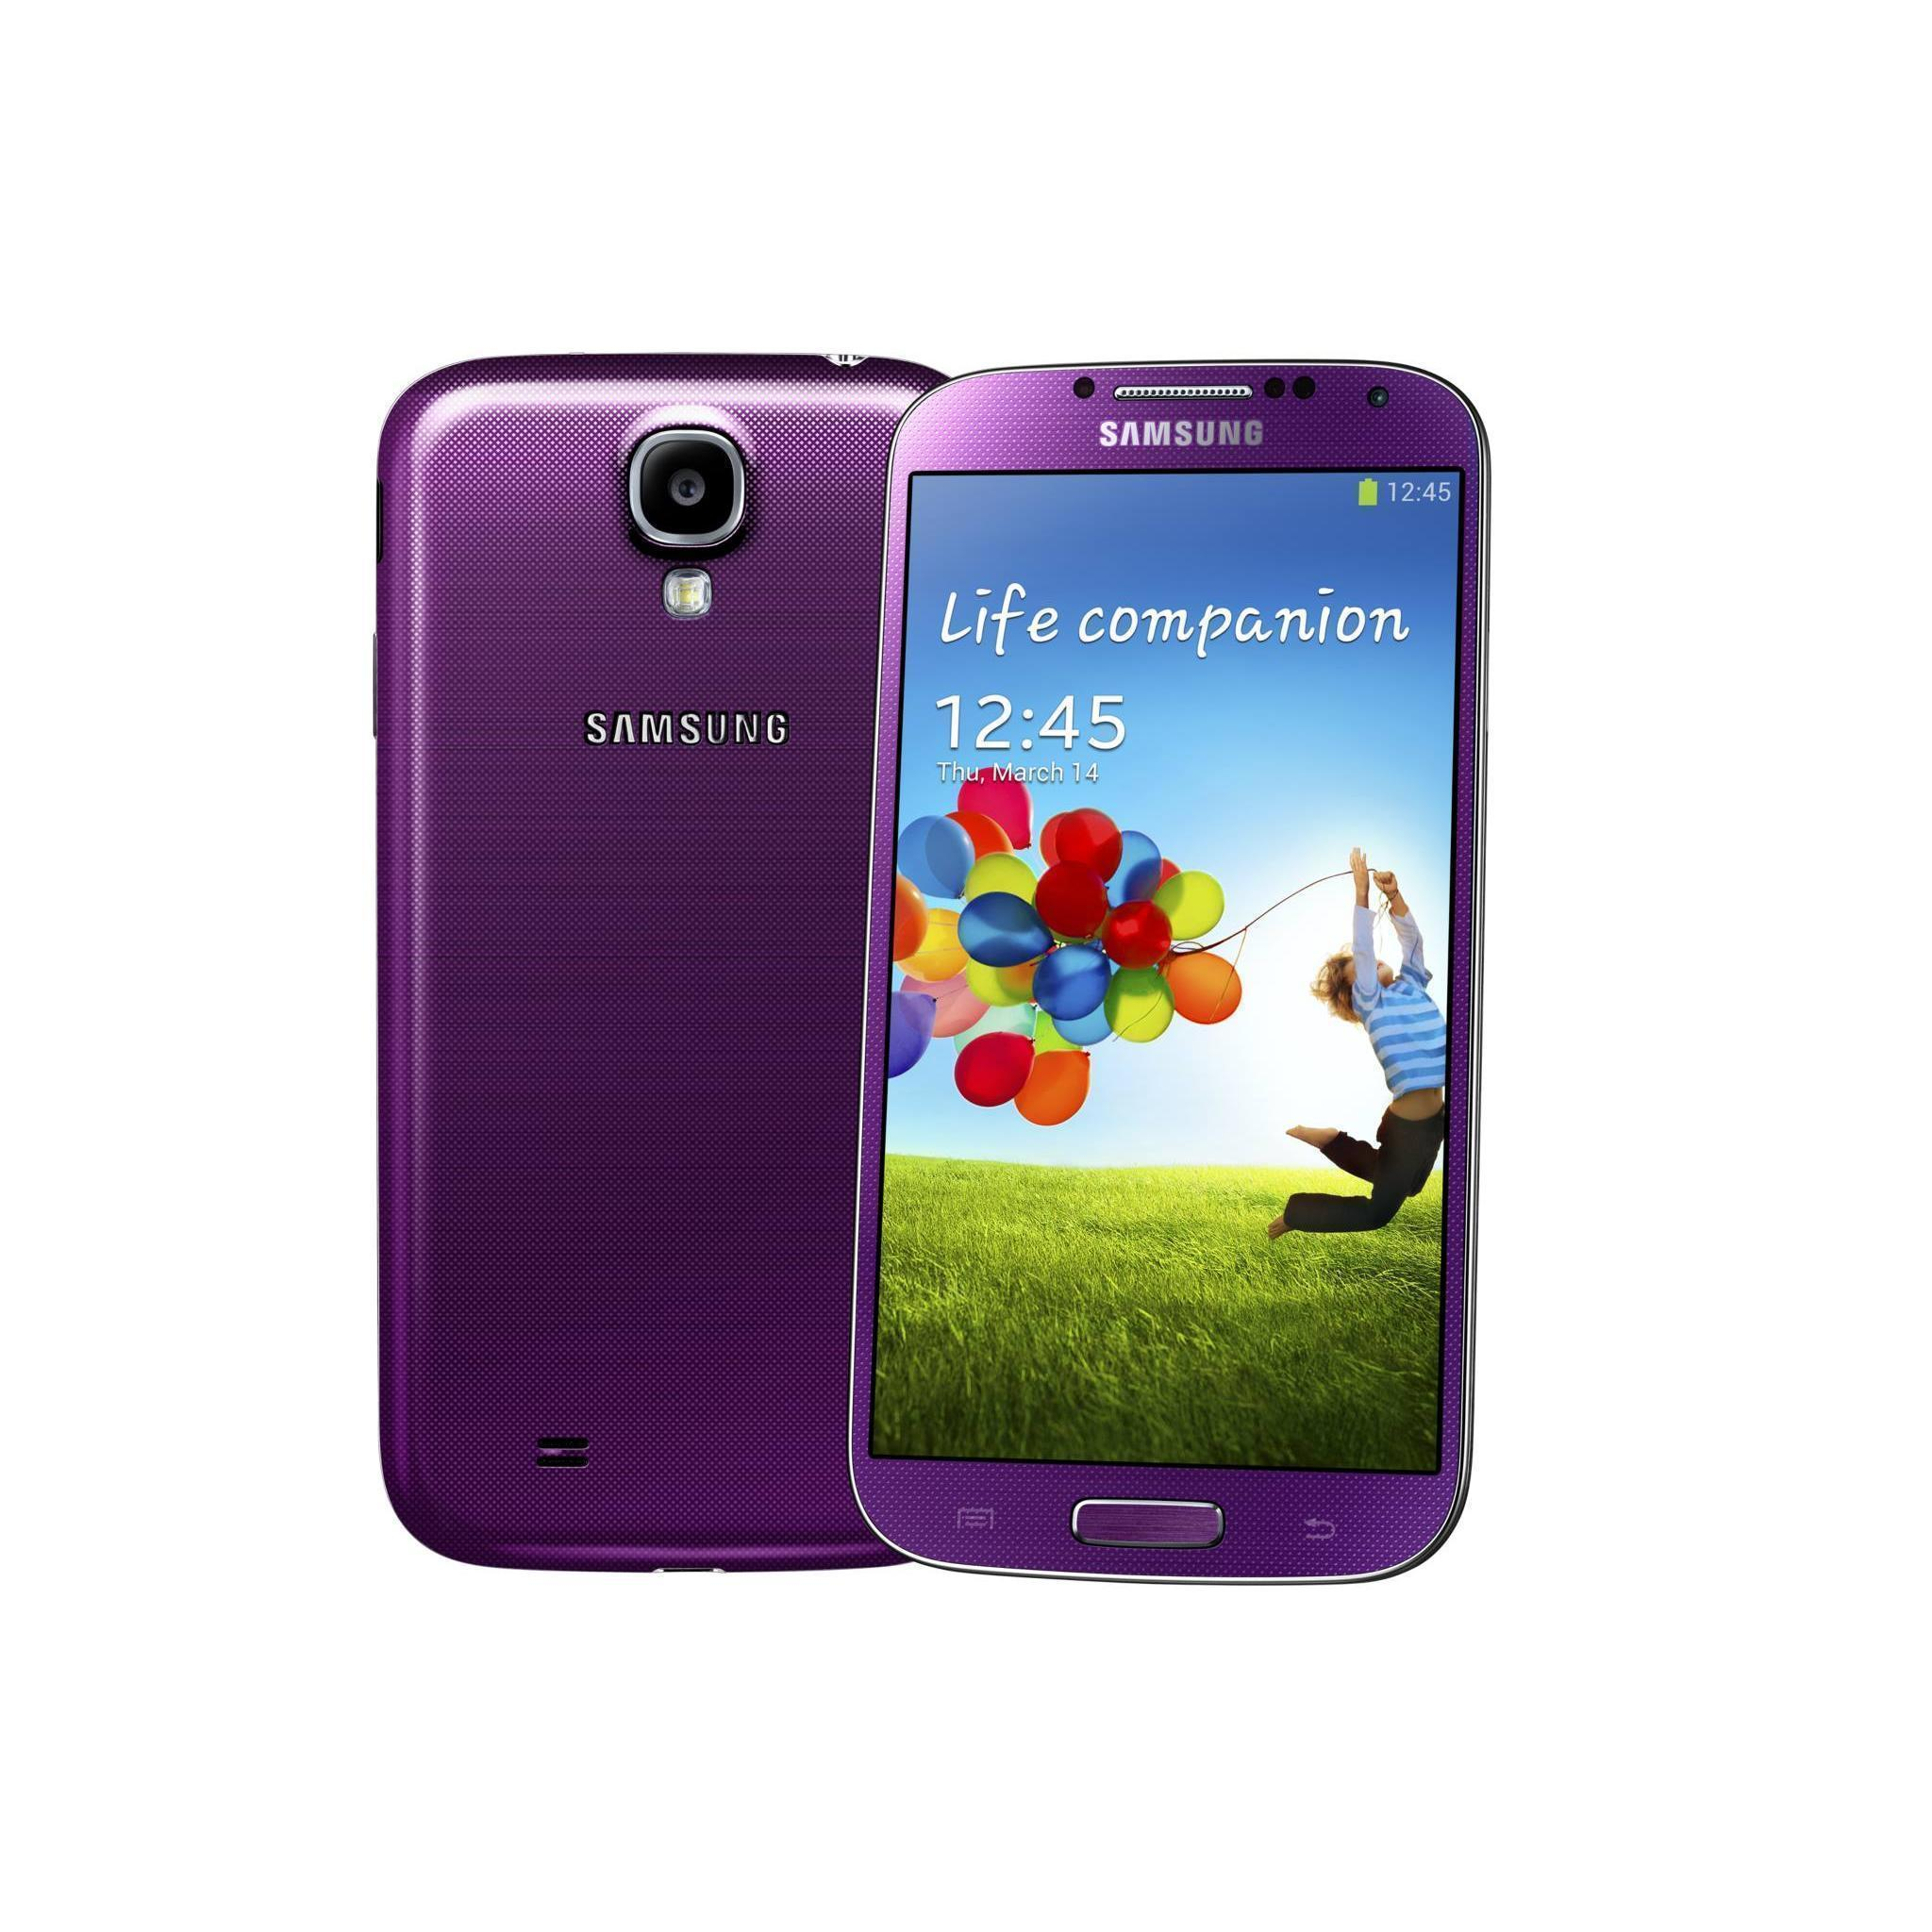 Samsung Galaxy S4 16 Gb i9505 4G - Violeta - Libre